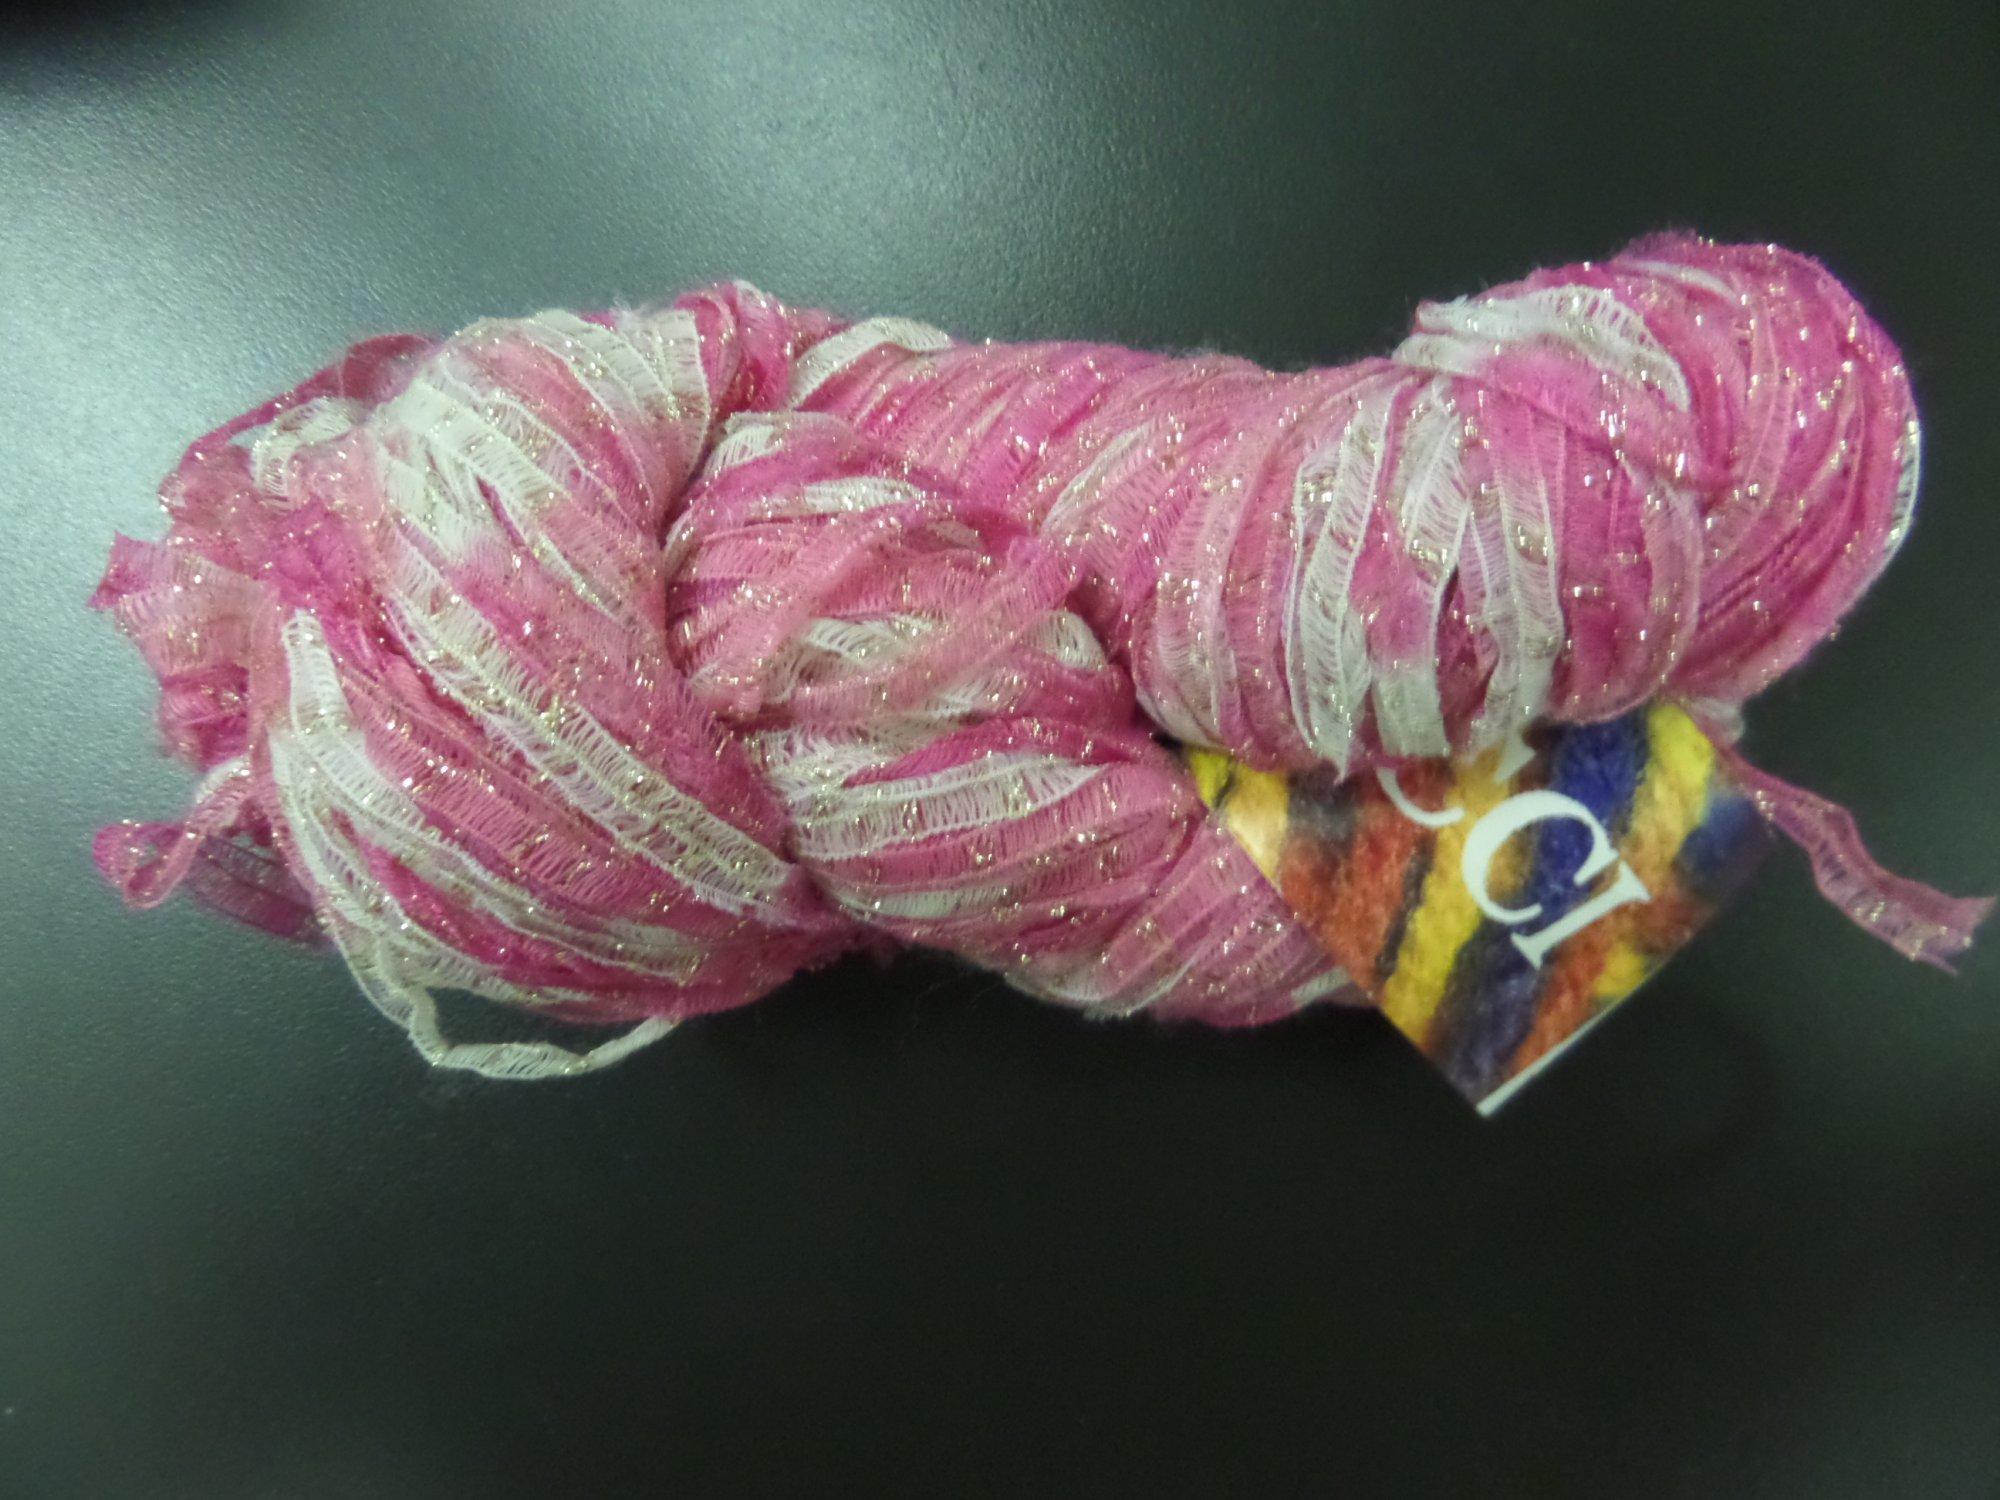 Metallic Ribbon Variegated yarn from Lucci Yarn